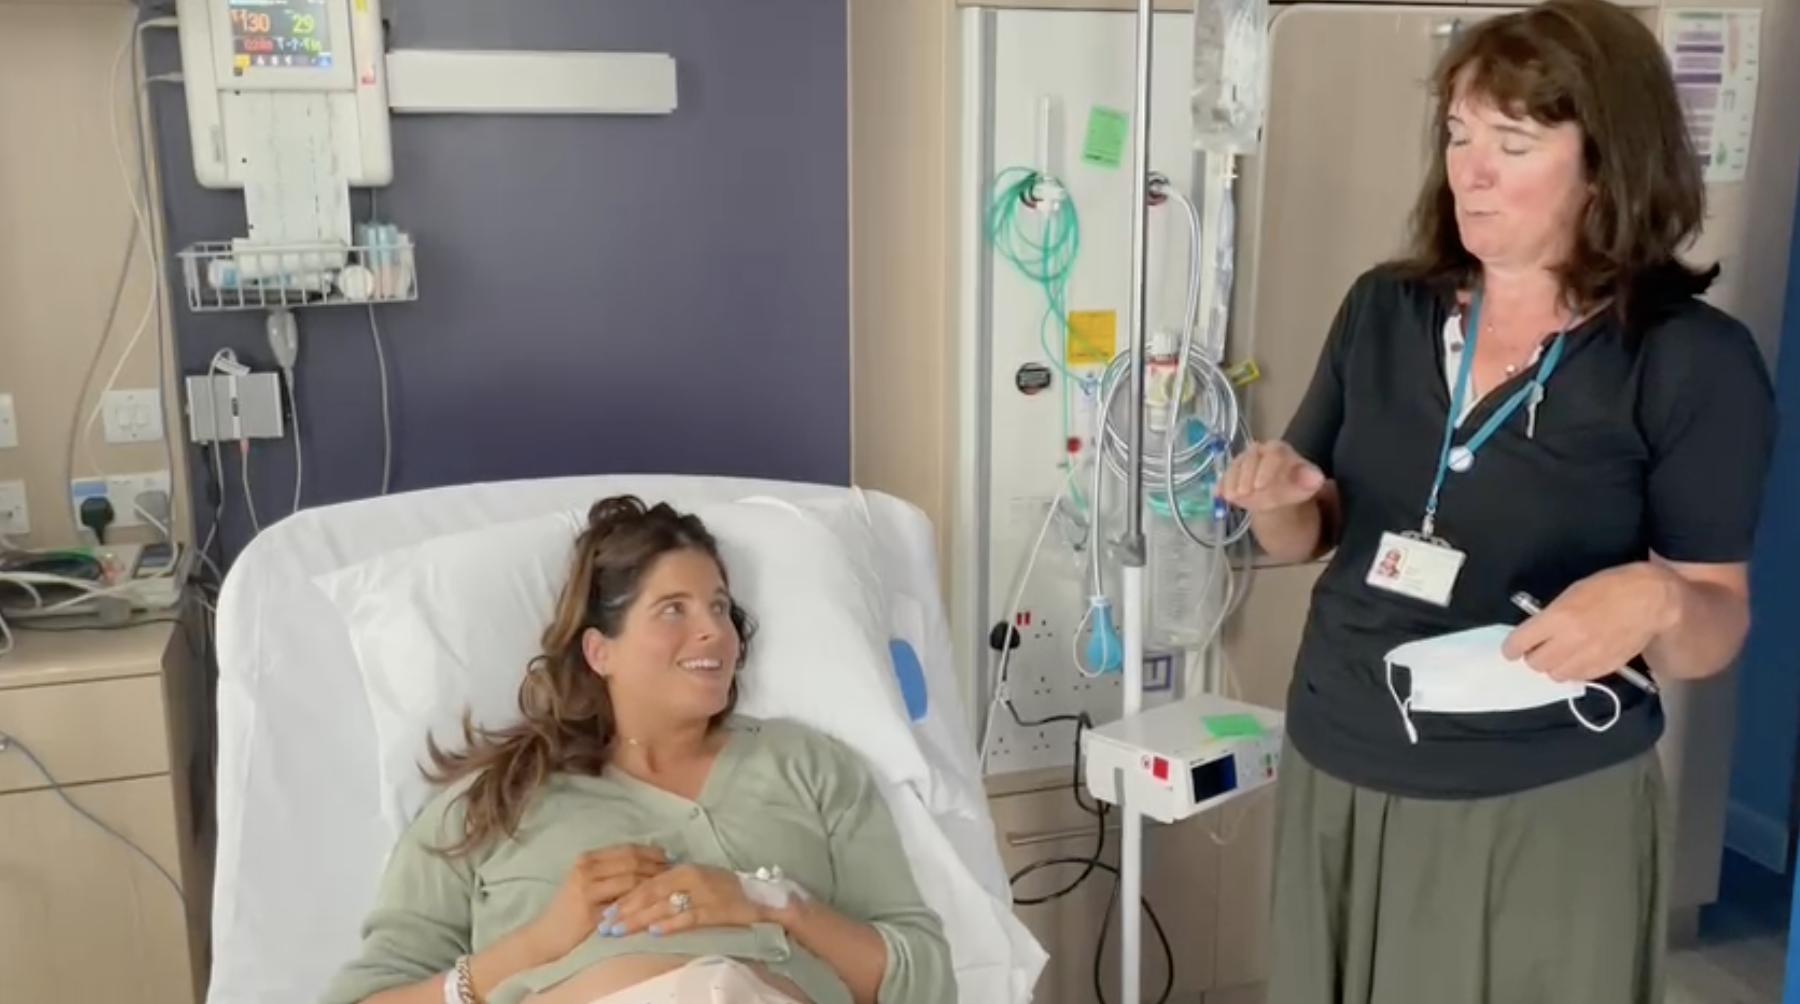 Binky Felstead on epidurals Video